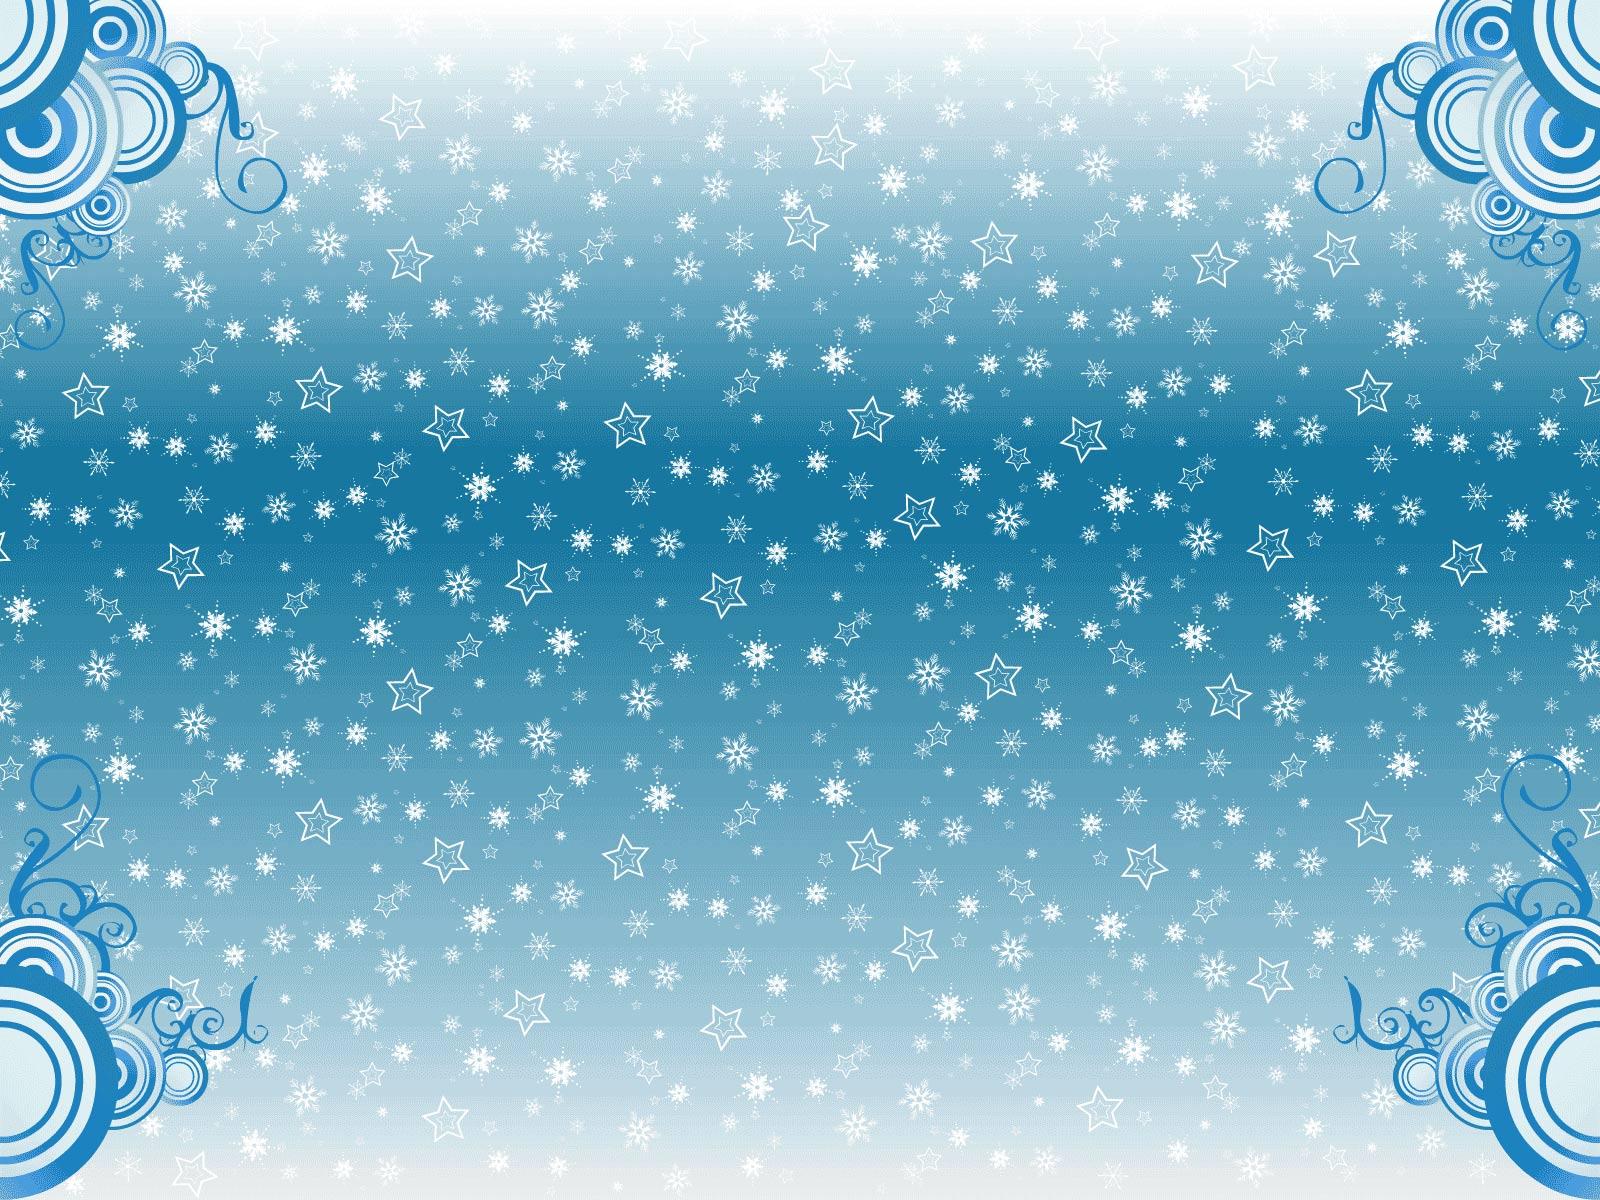 winter Desktop Wallpaper High Quality WallpapersWallpaper Desktop 1600x1200